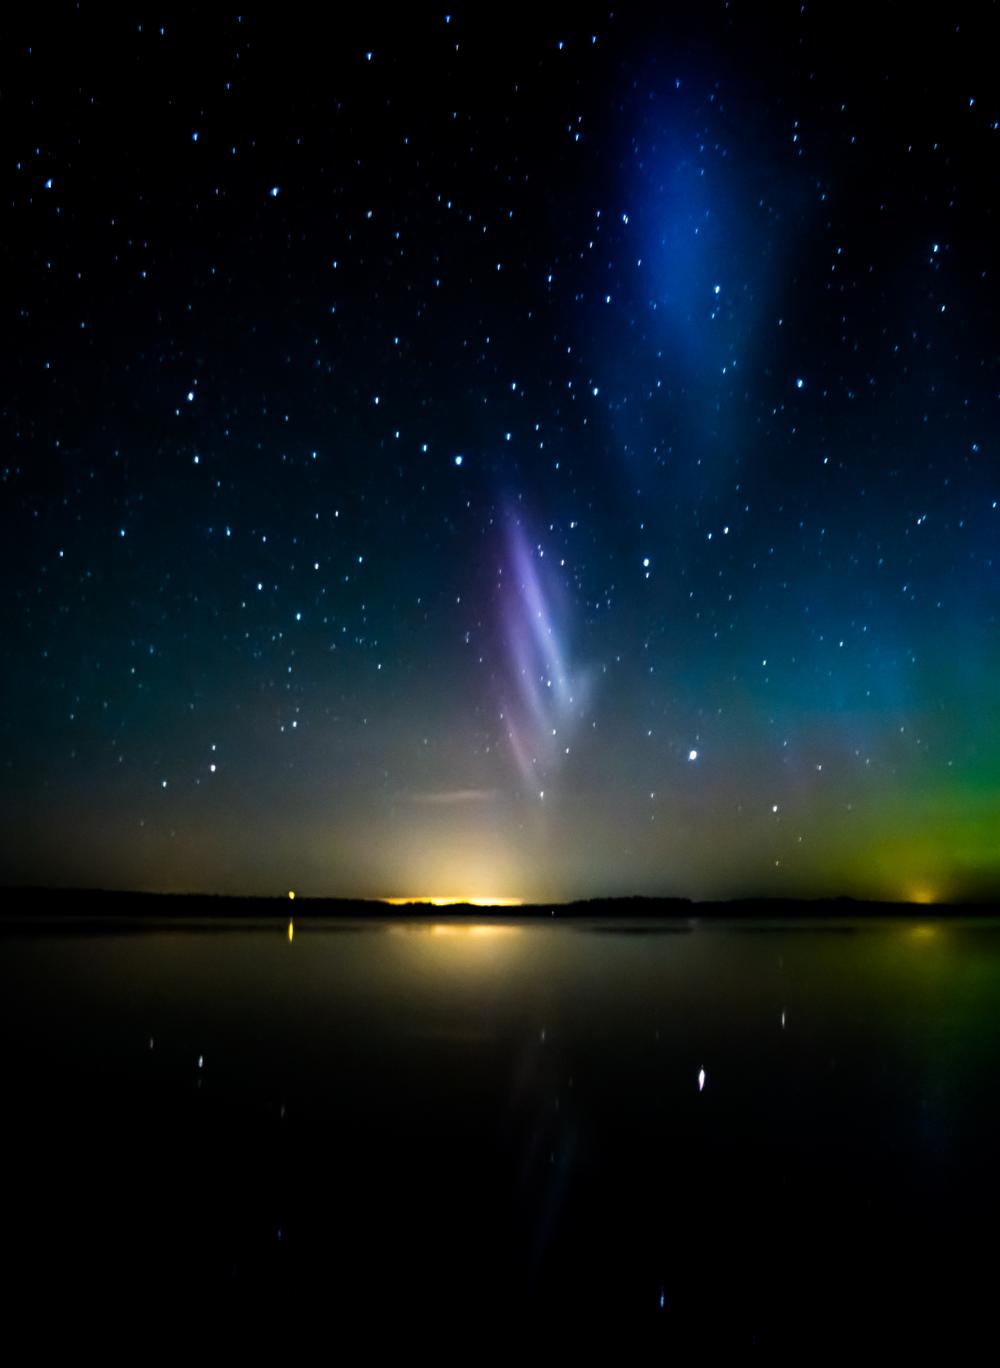 Steve Clickasnap Aurora Sky Scenery Aurora Borealis Decor